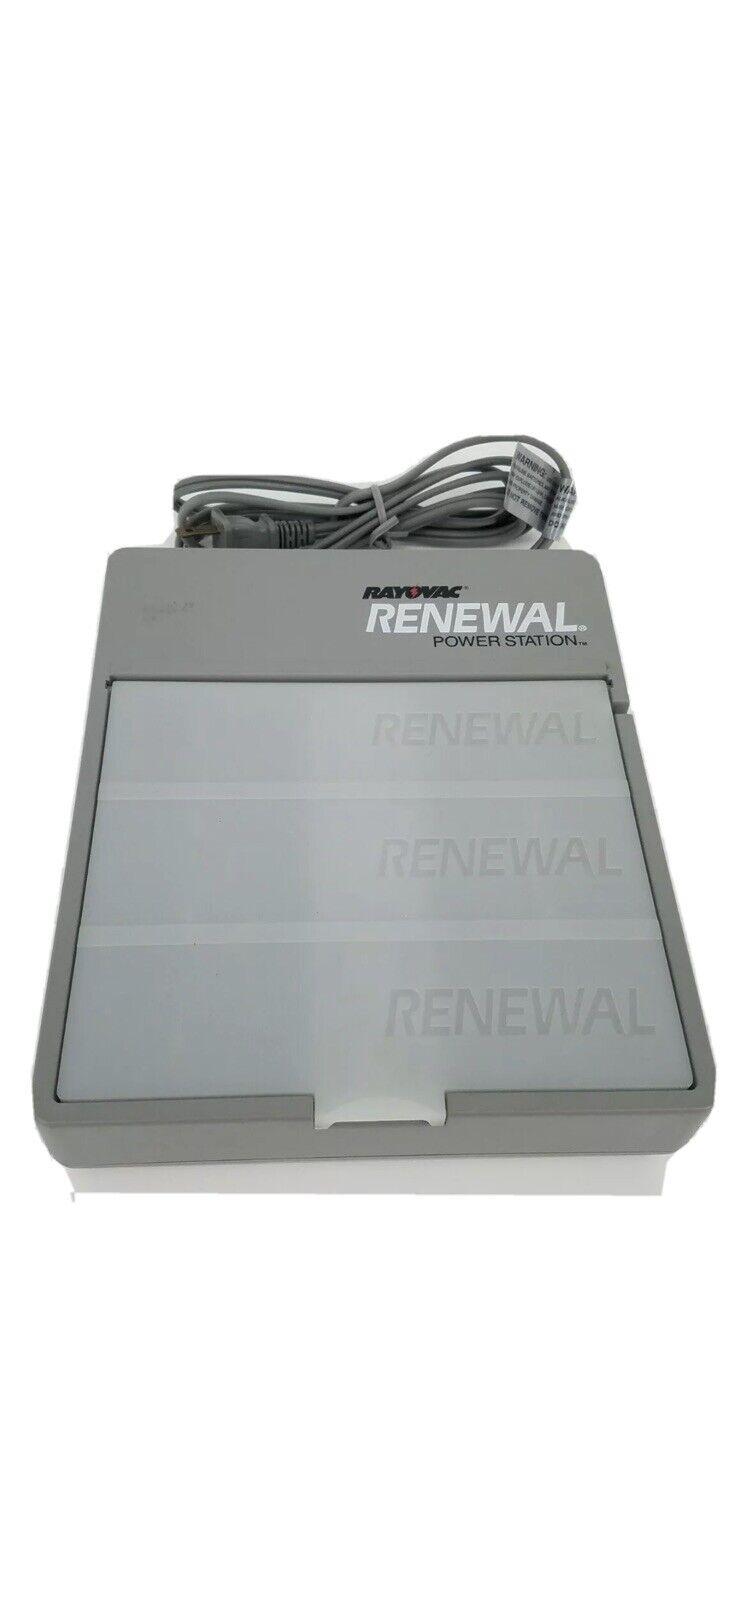 Rayovac Renewal Power Station PS2 for AA-AAA-C-D Renewal Rayovac Batteries